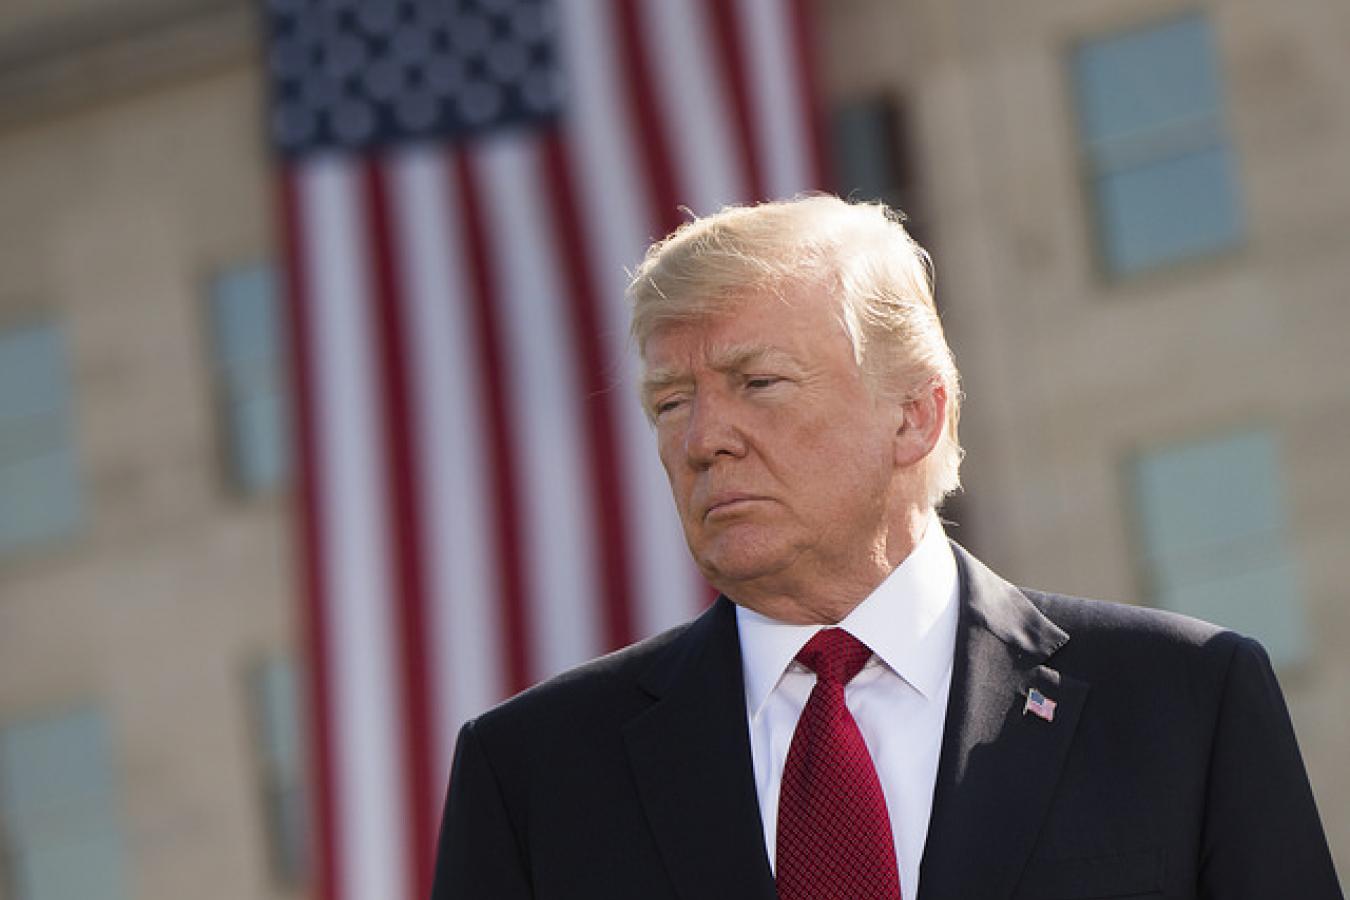 Trump, Pentagon leaders honor 9/11 victims